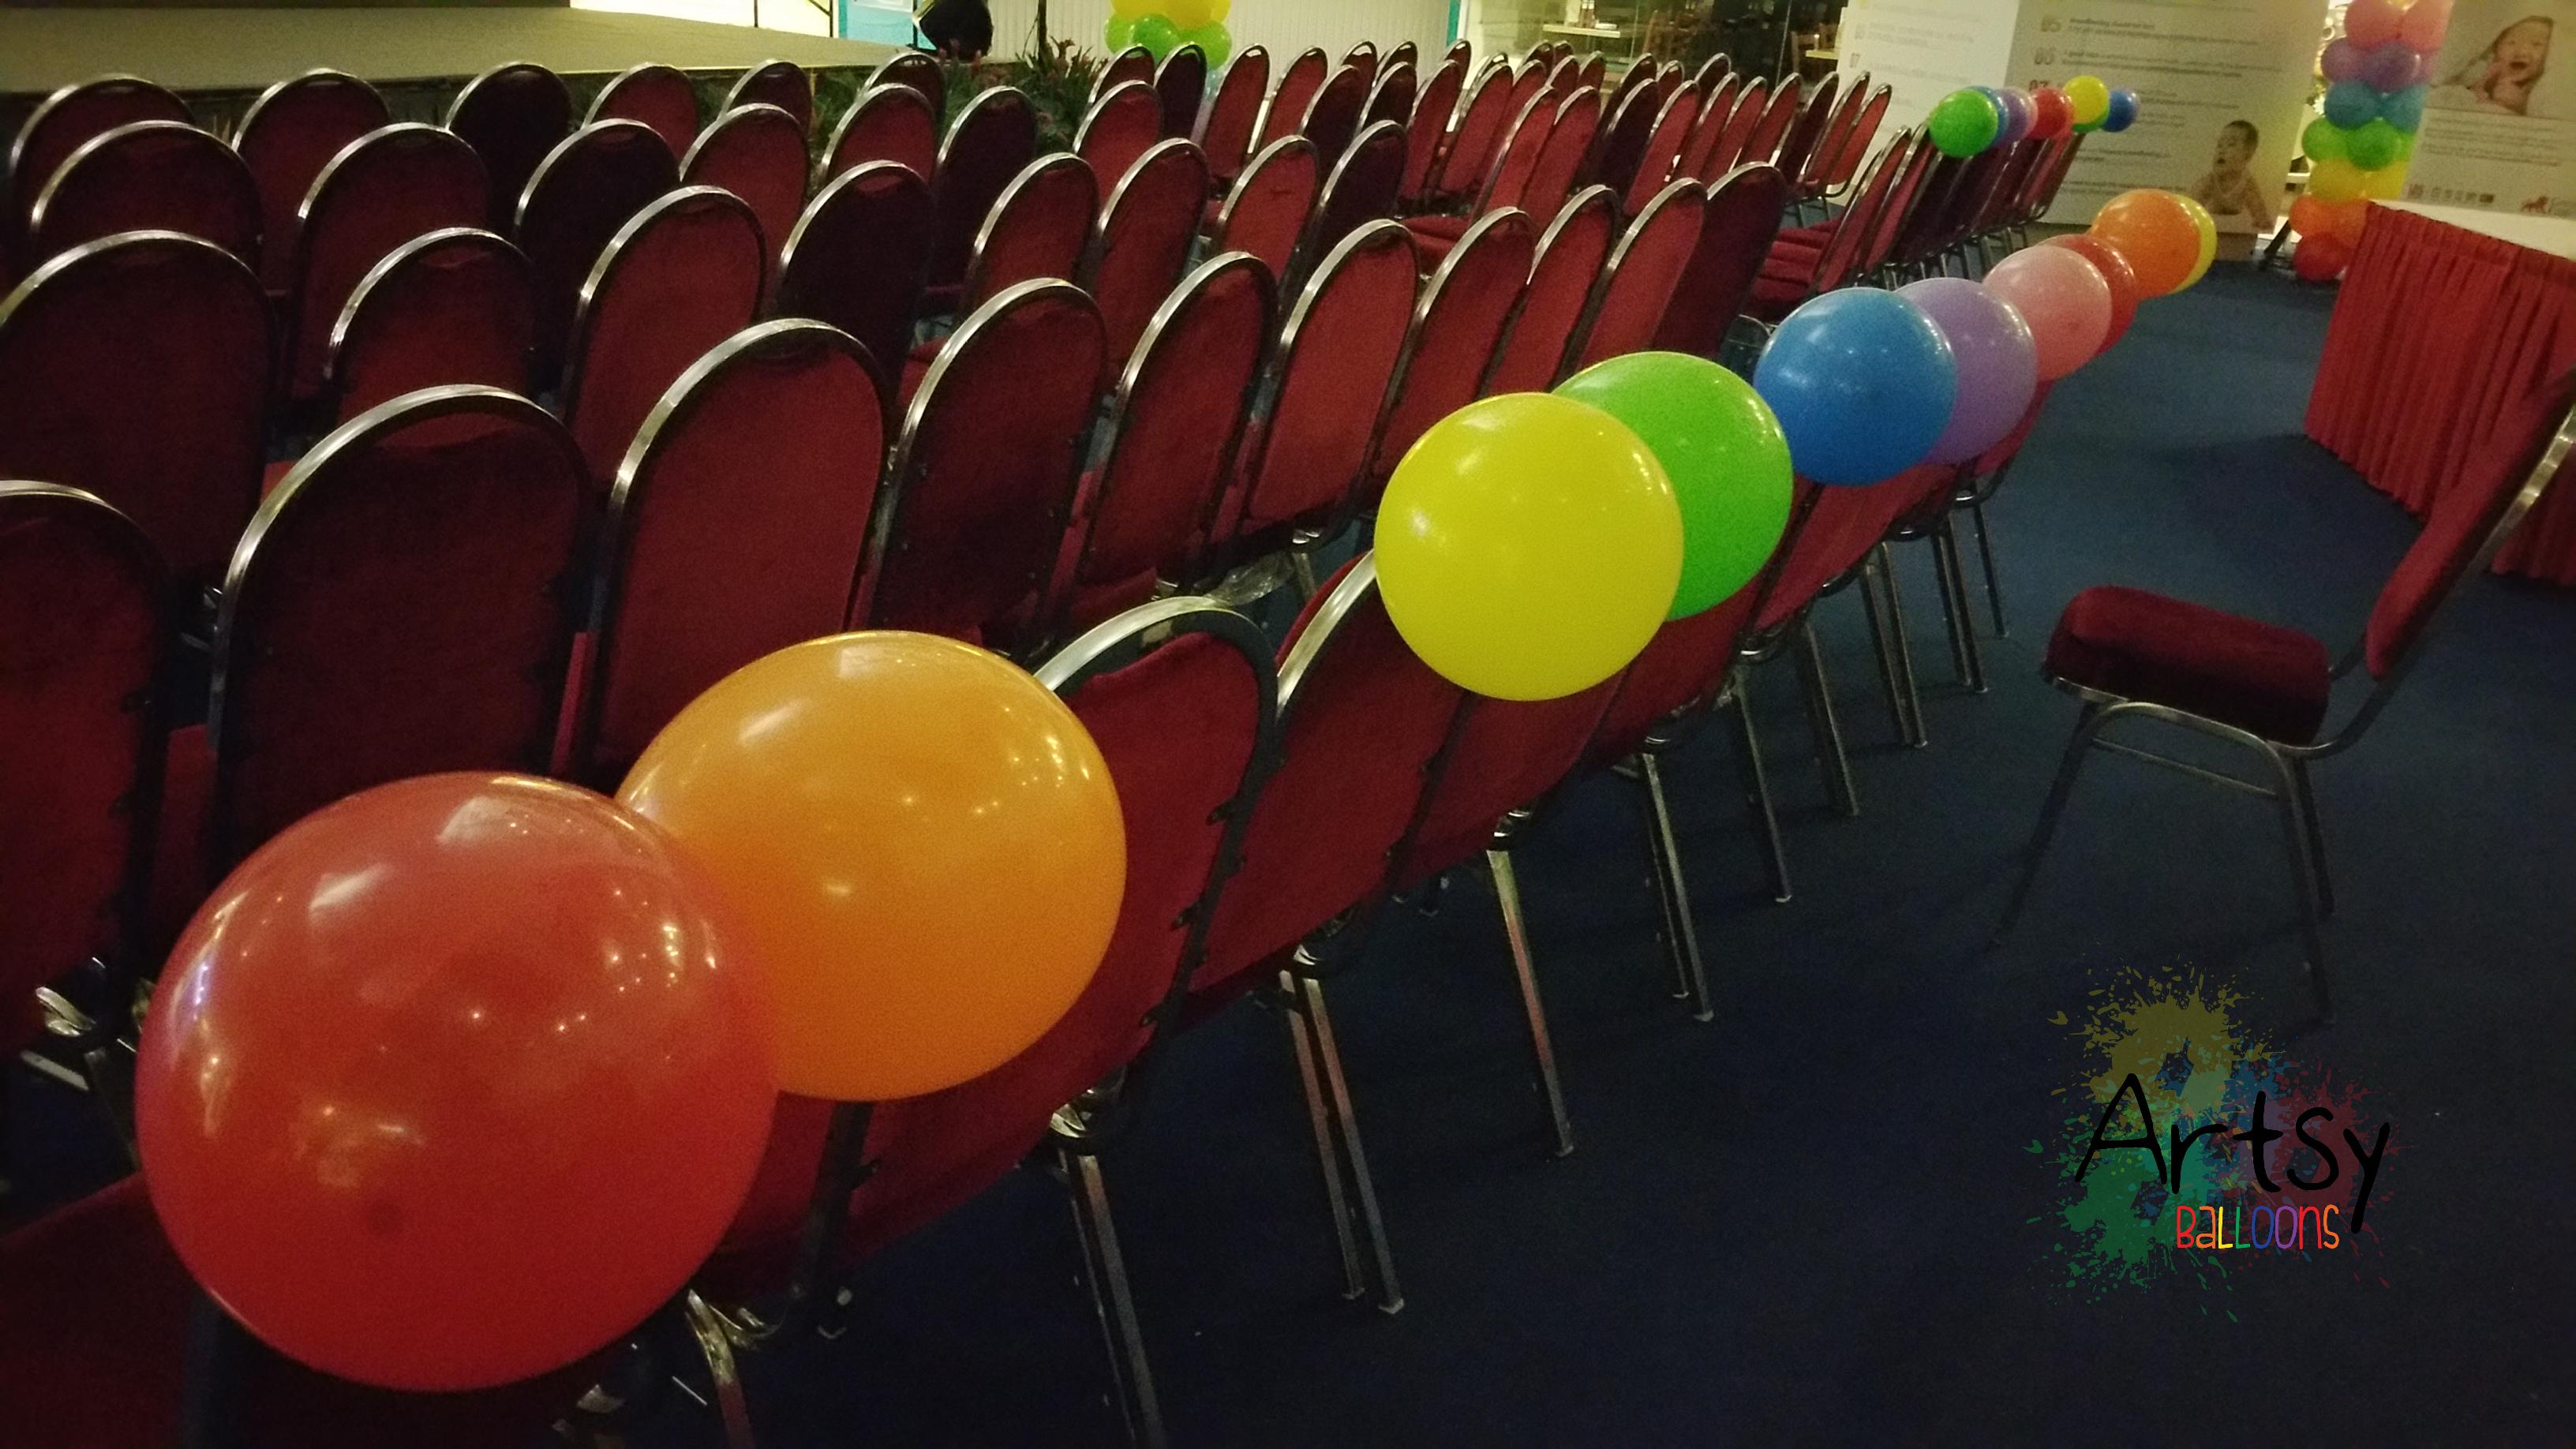 , Fringe balloon decorations, Singapore Balloon Decoration Services - Balloon Workshop and Balloon Sculpting